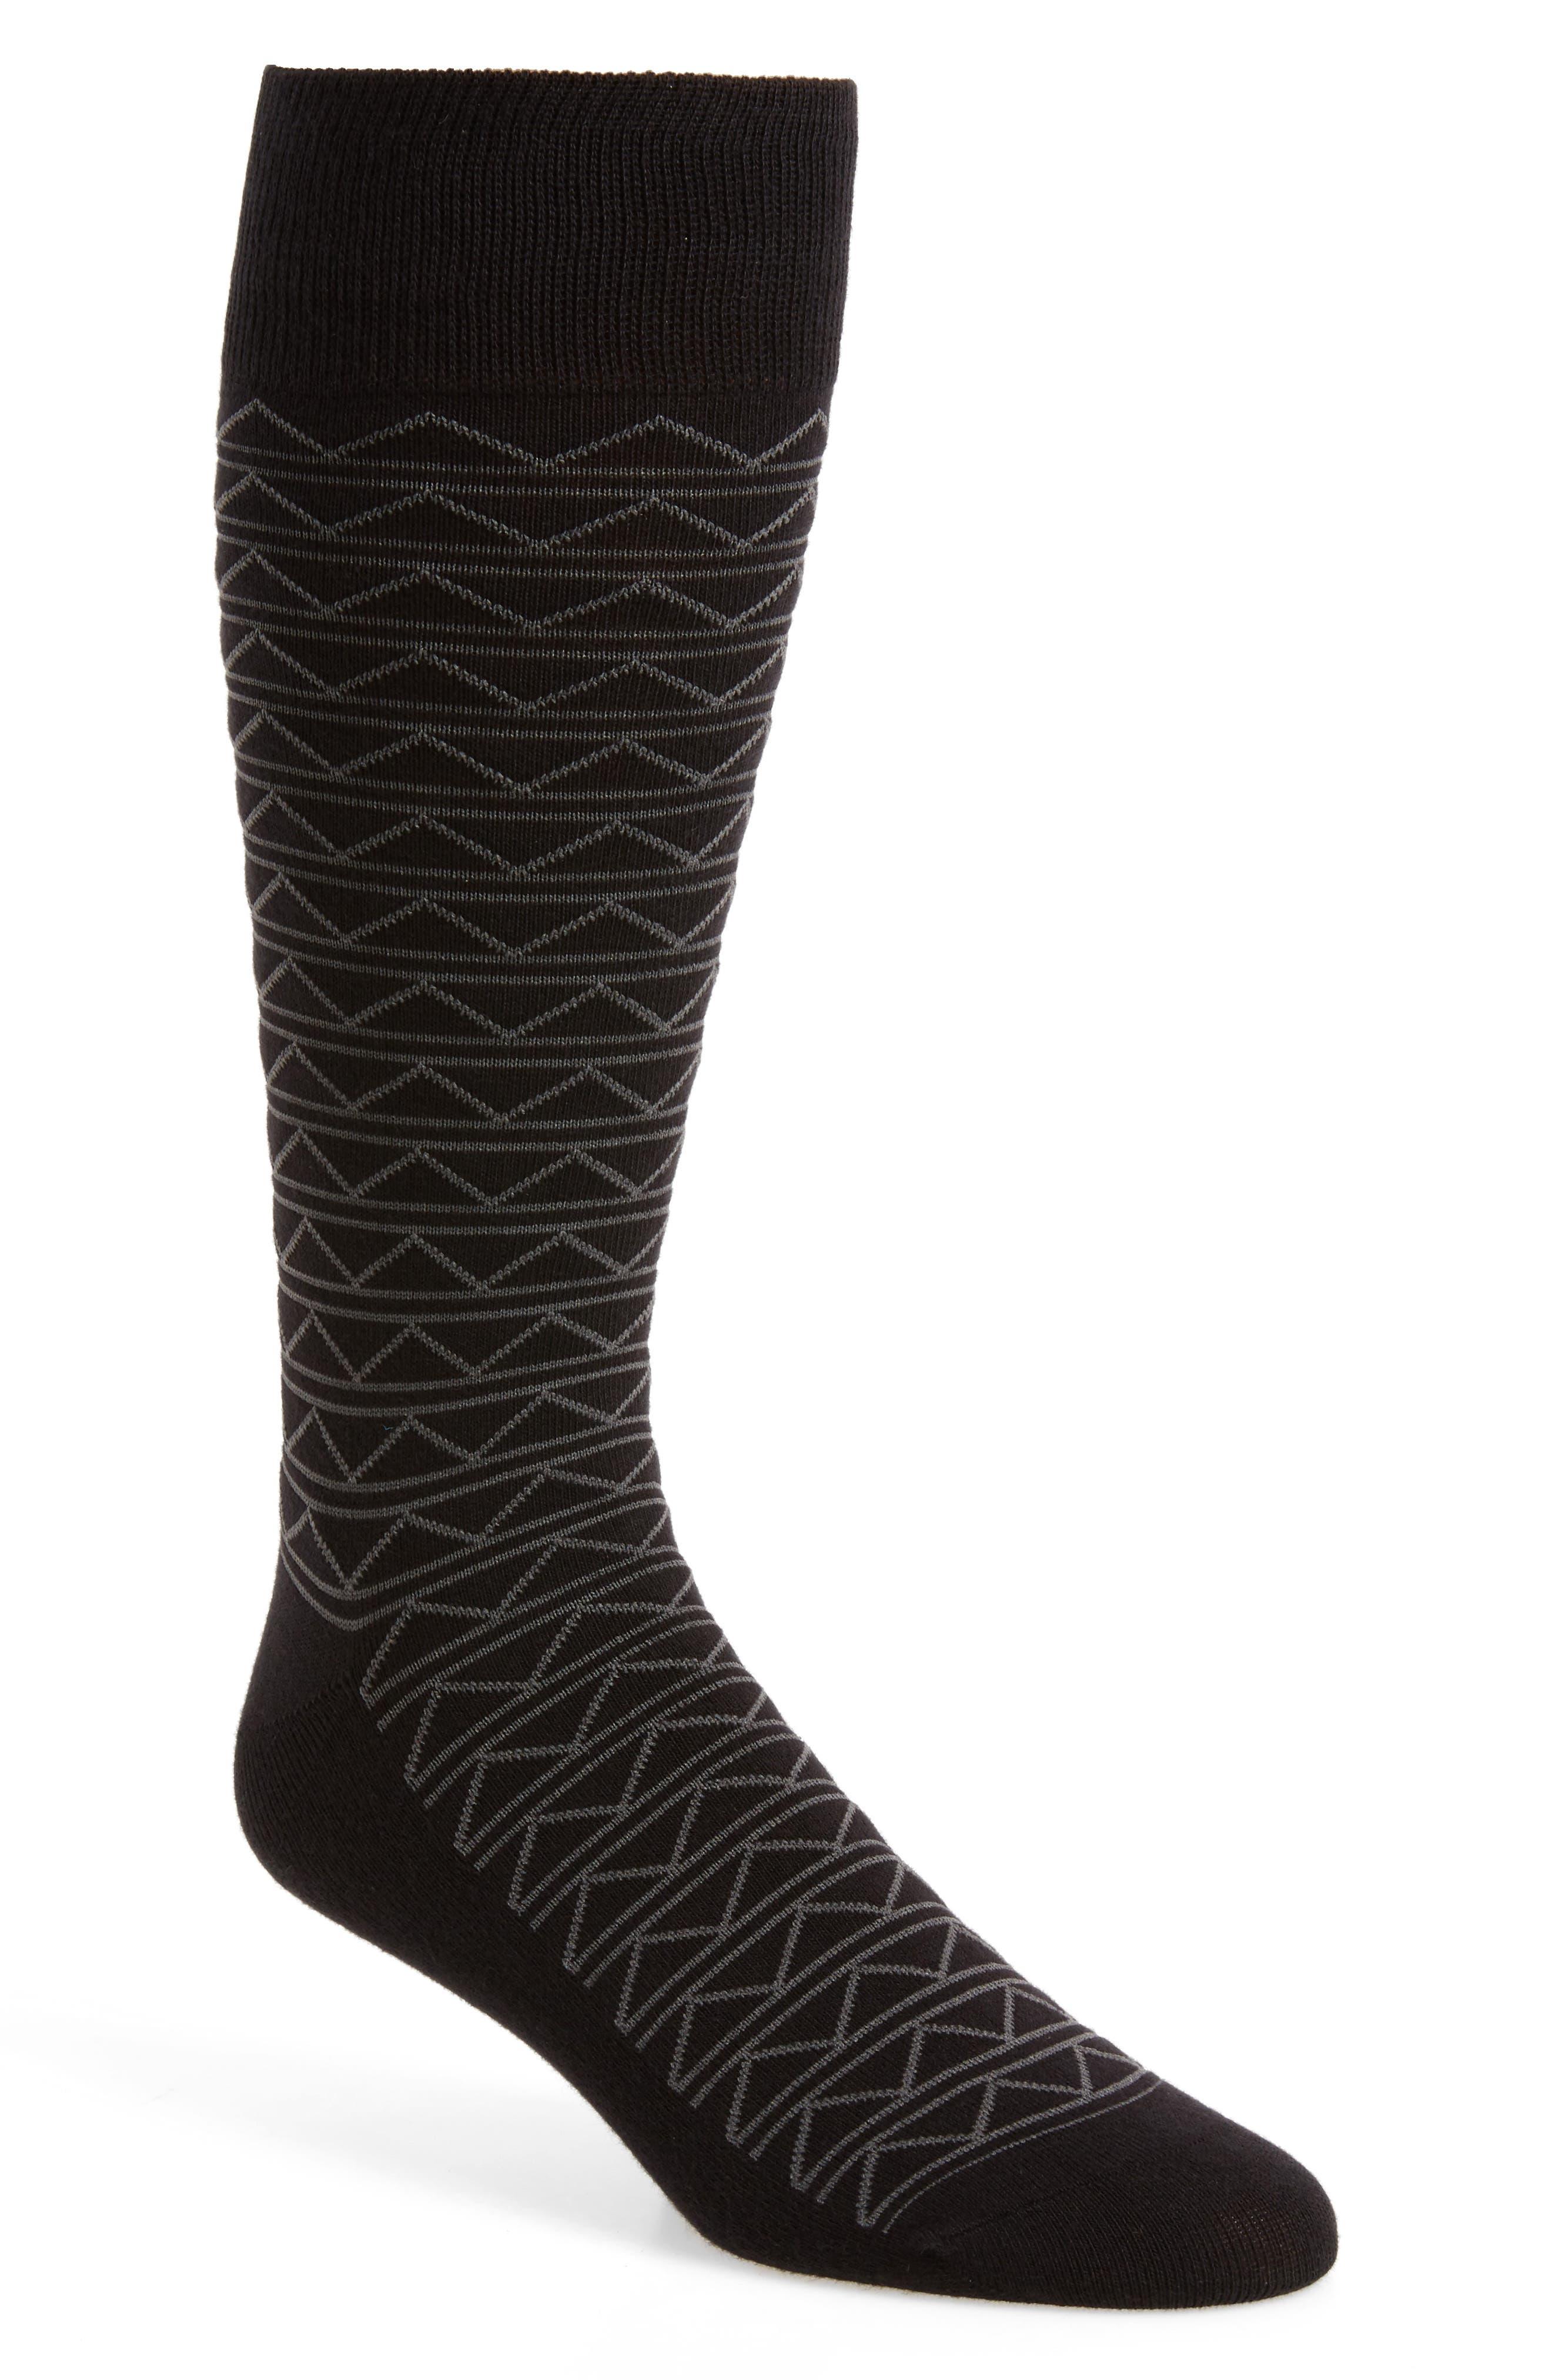 Calibrate Zigzag Socks